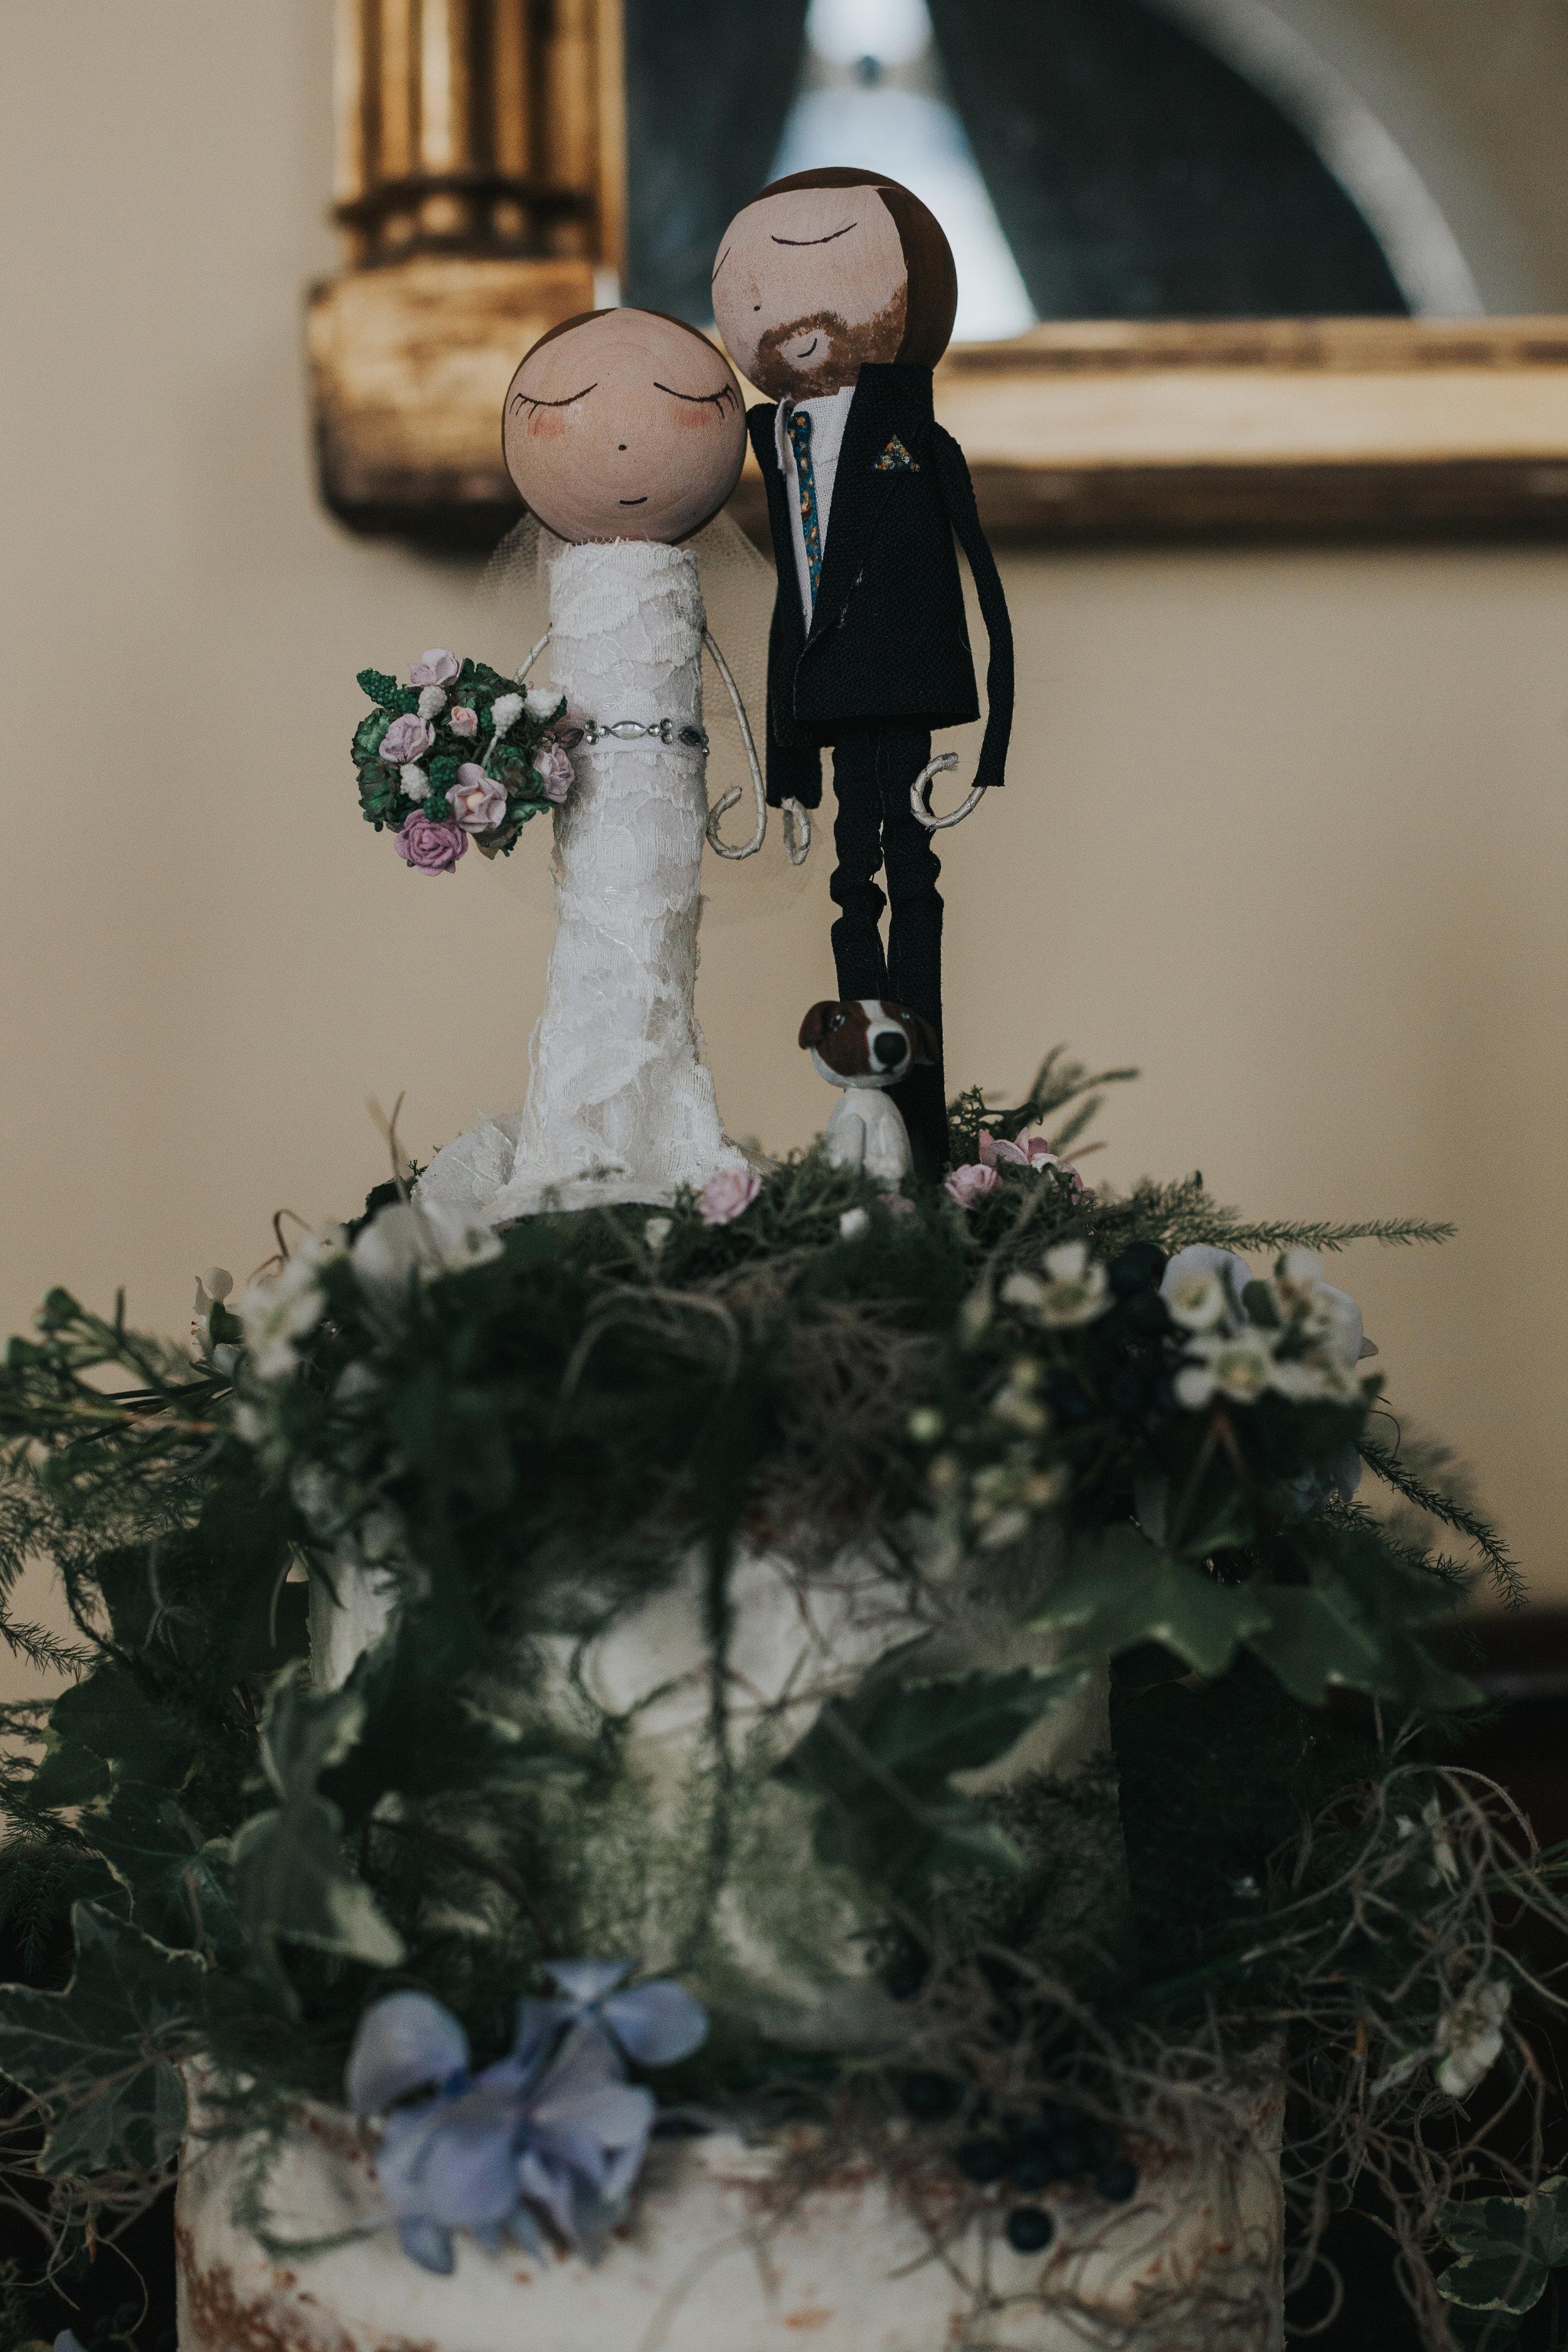 Bride and groom cake topper on wedding cake.